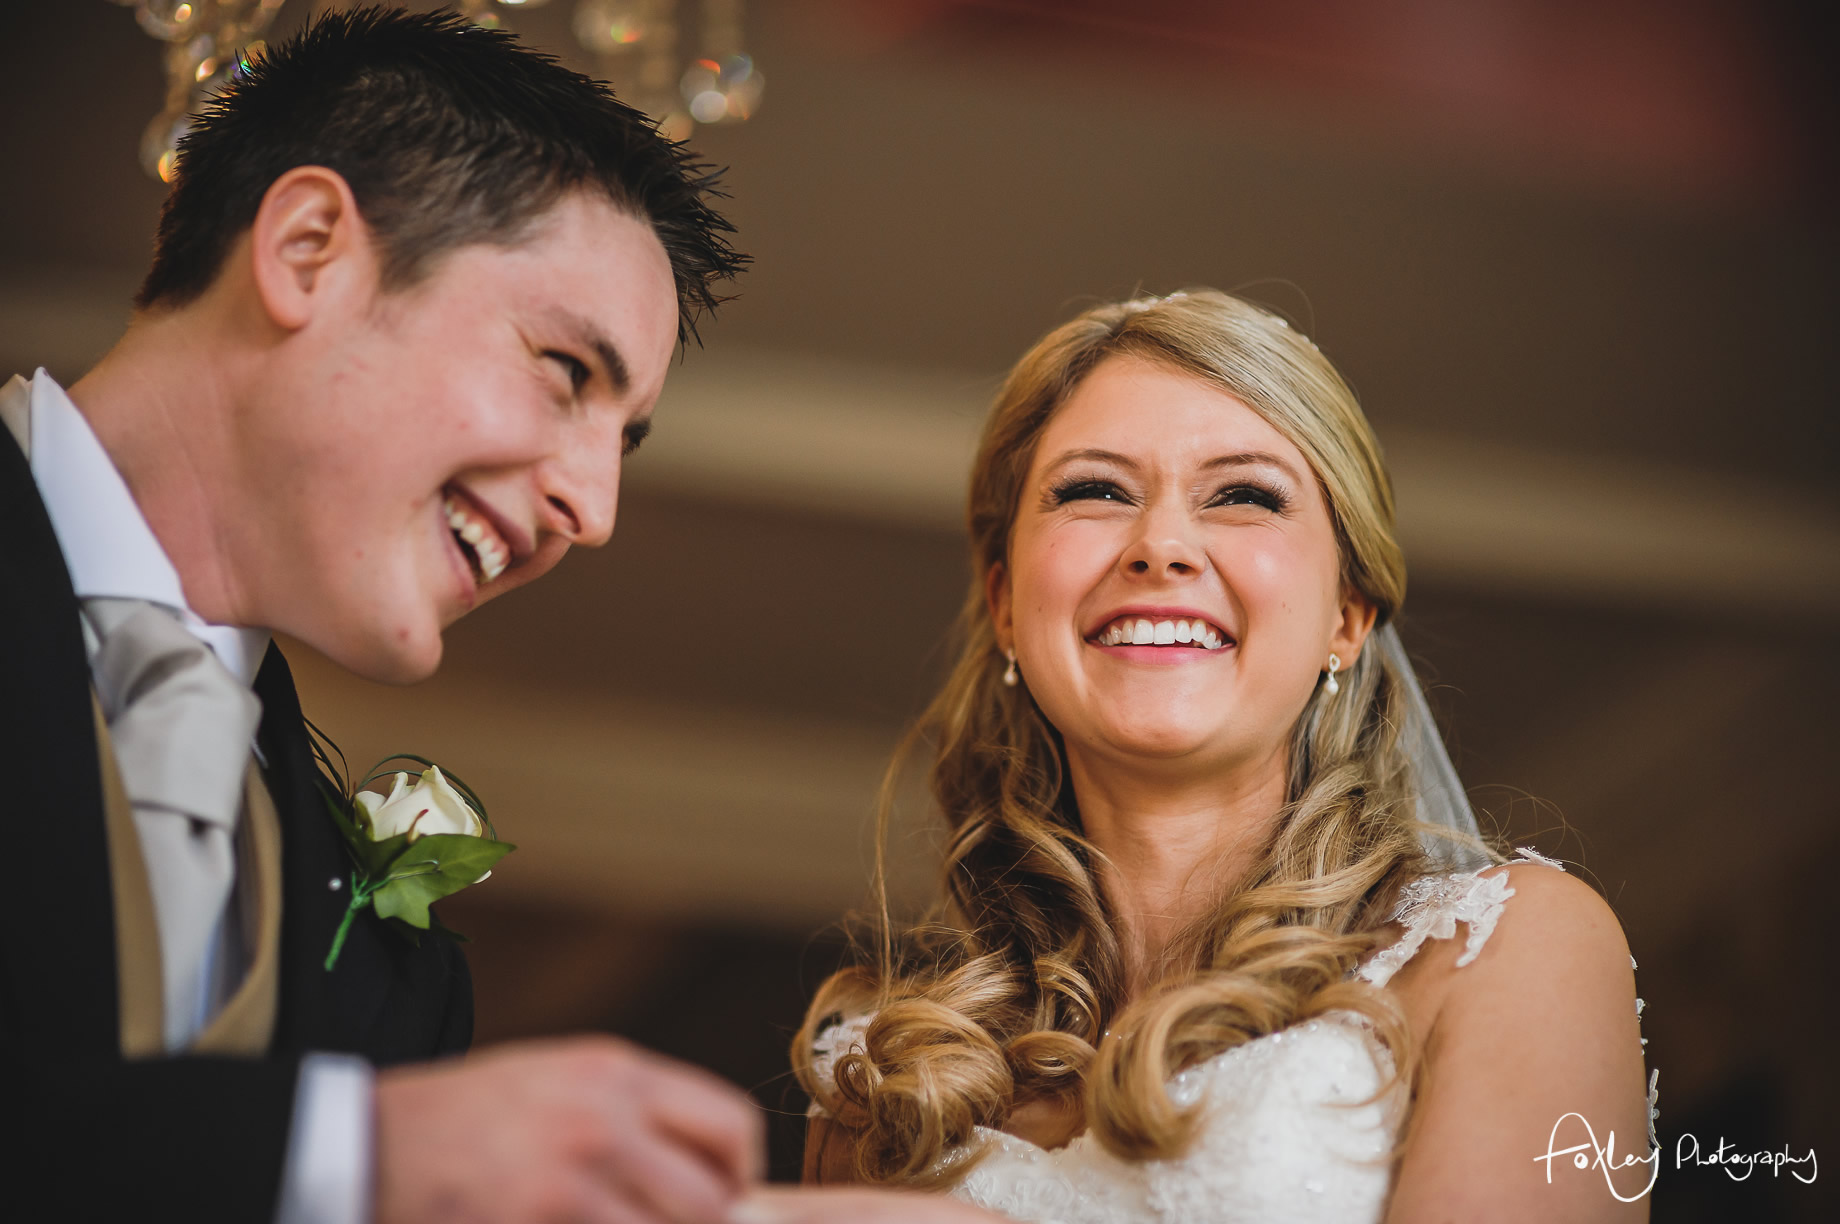 Gemma and Lewis' Wedding at Mitton Hall 081